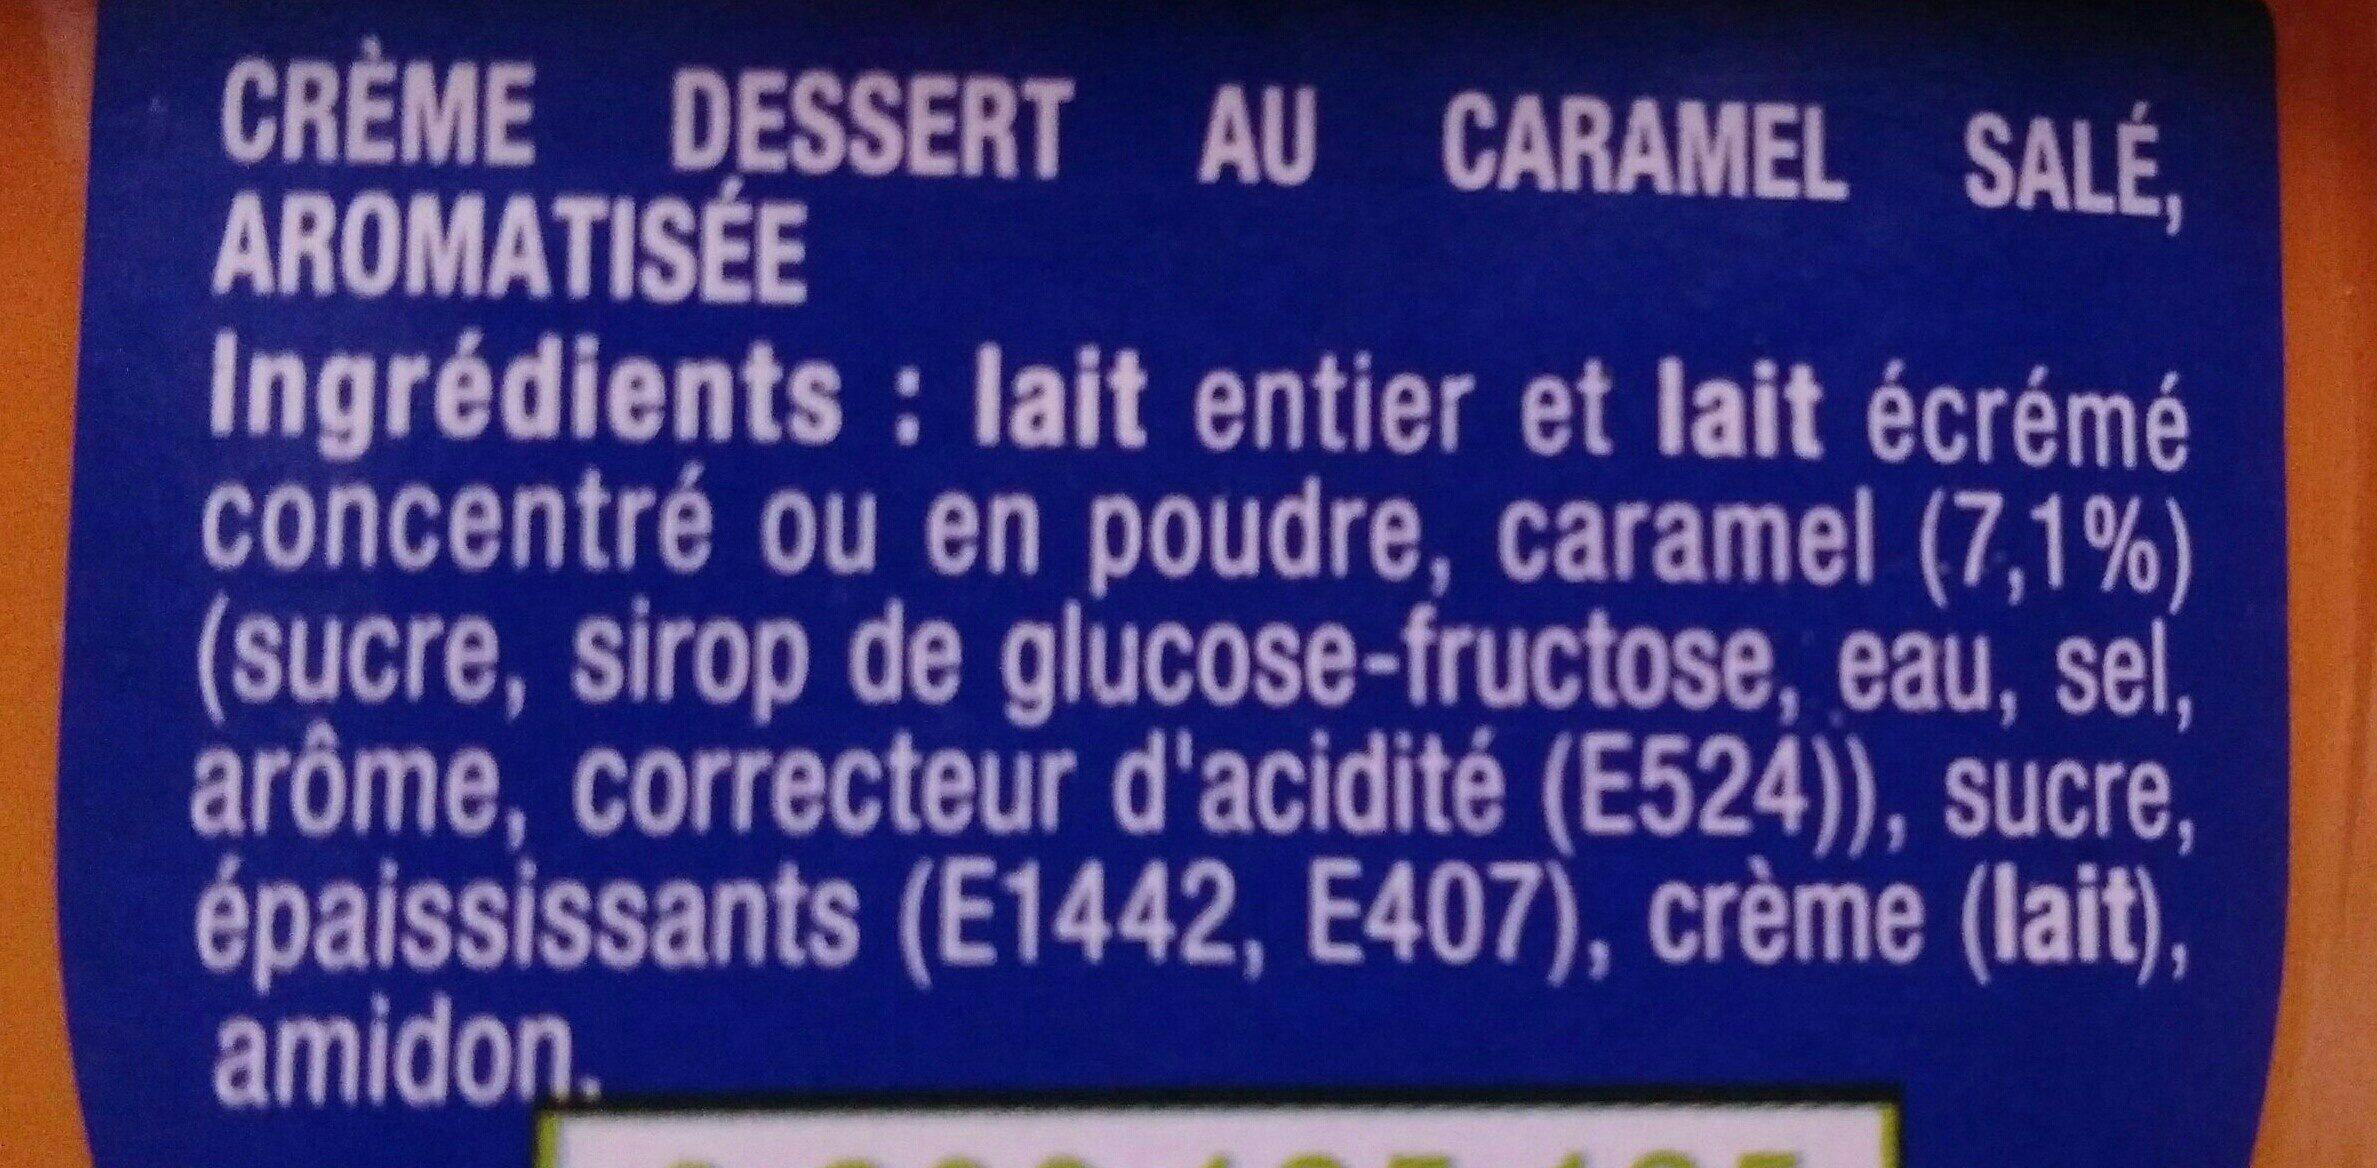 Danette Caramel salé - Ingrédients - fr